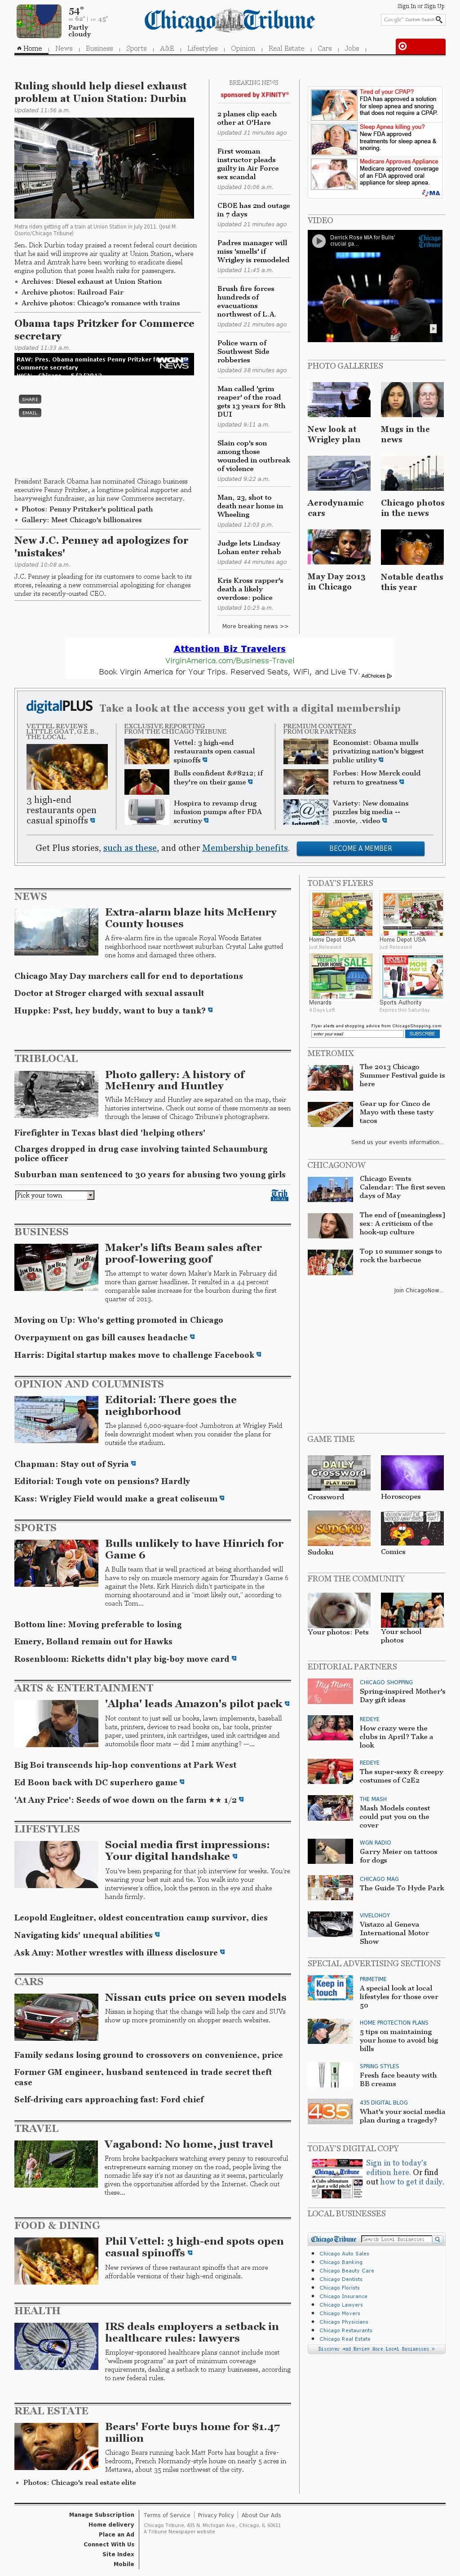 Chicago Tribune at Thursday May 2, 2013, 6:04 p.m. UTC